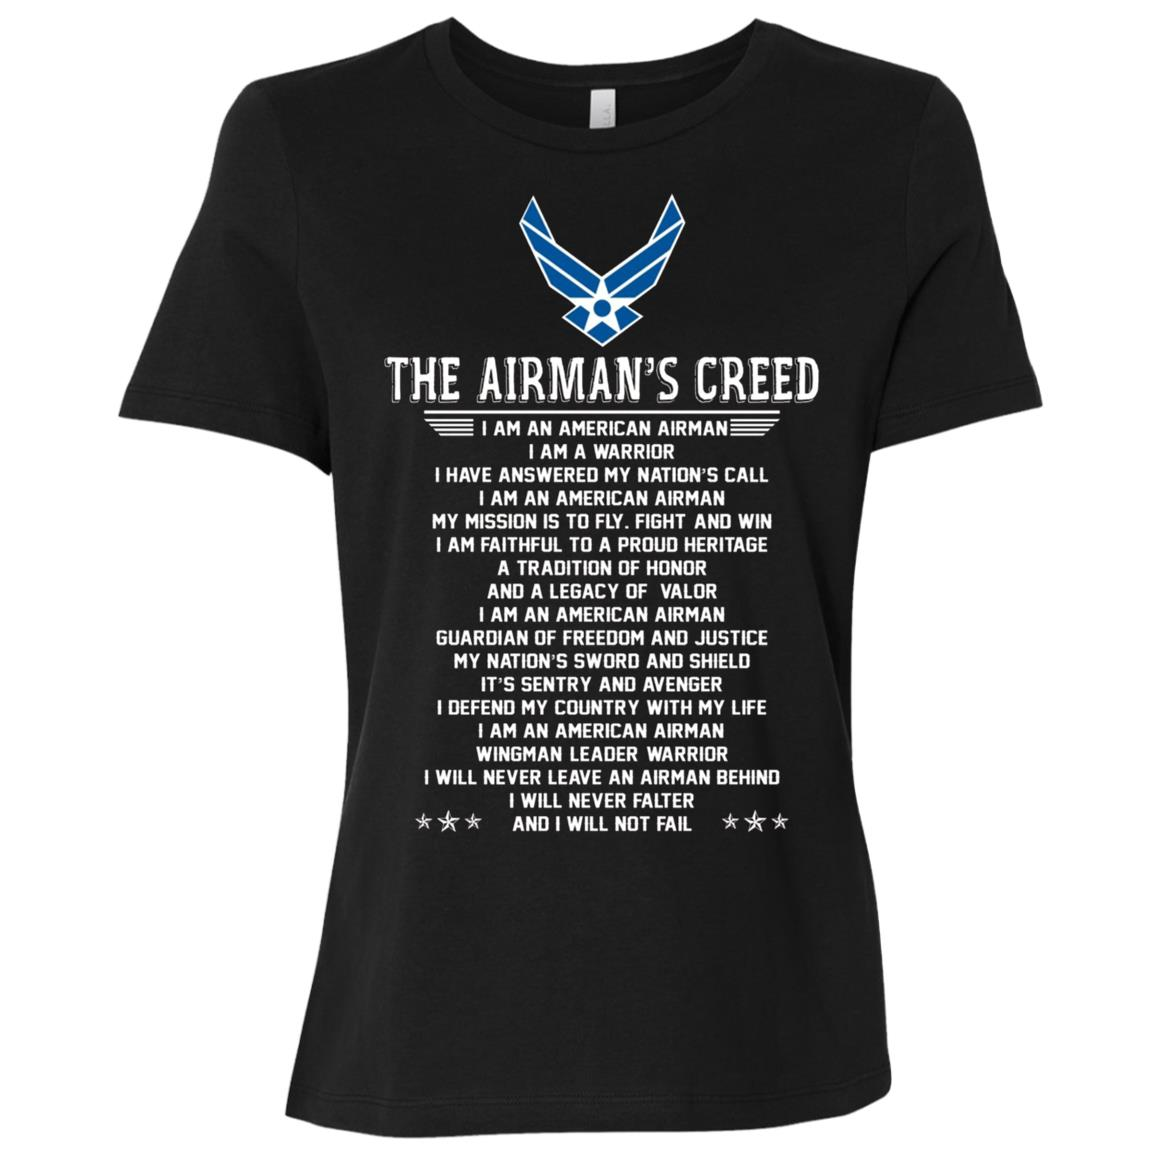 The Airman's Creed Women Short Sleeve T-Shirt